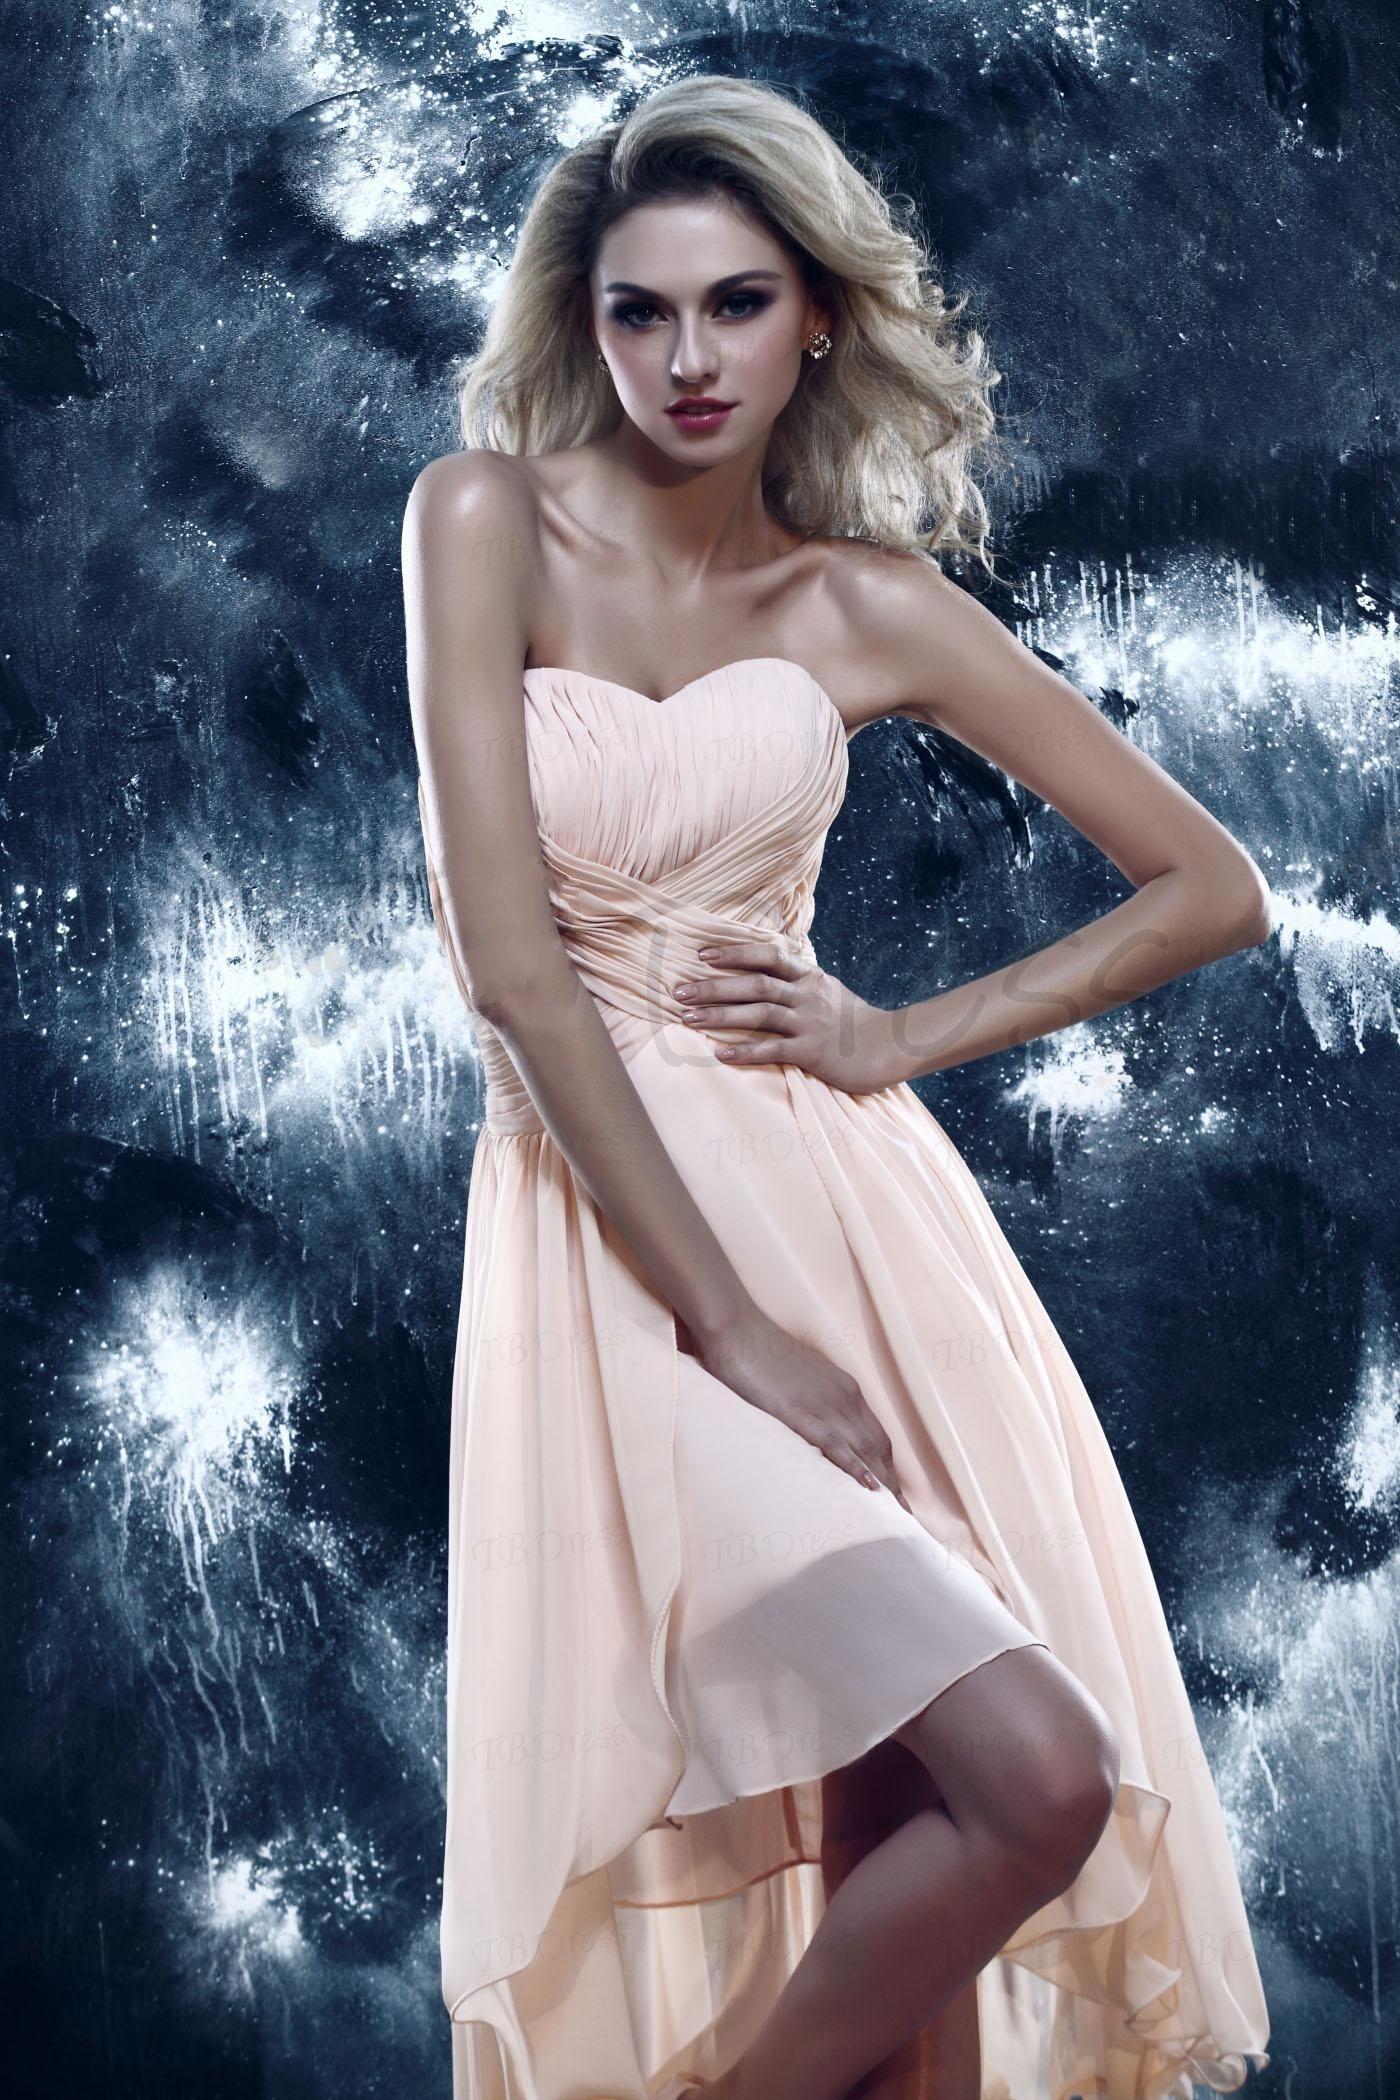 2013 Custom Chic A-Line Sweetheart Dasha's Prom Homecoming Dress Abito da damigella d'onore